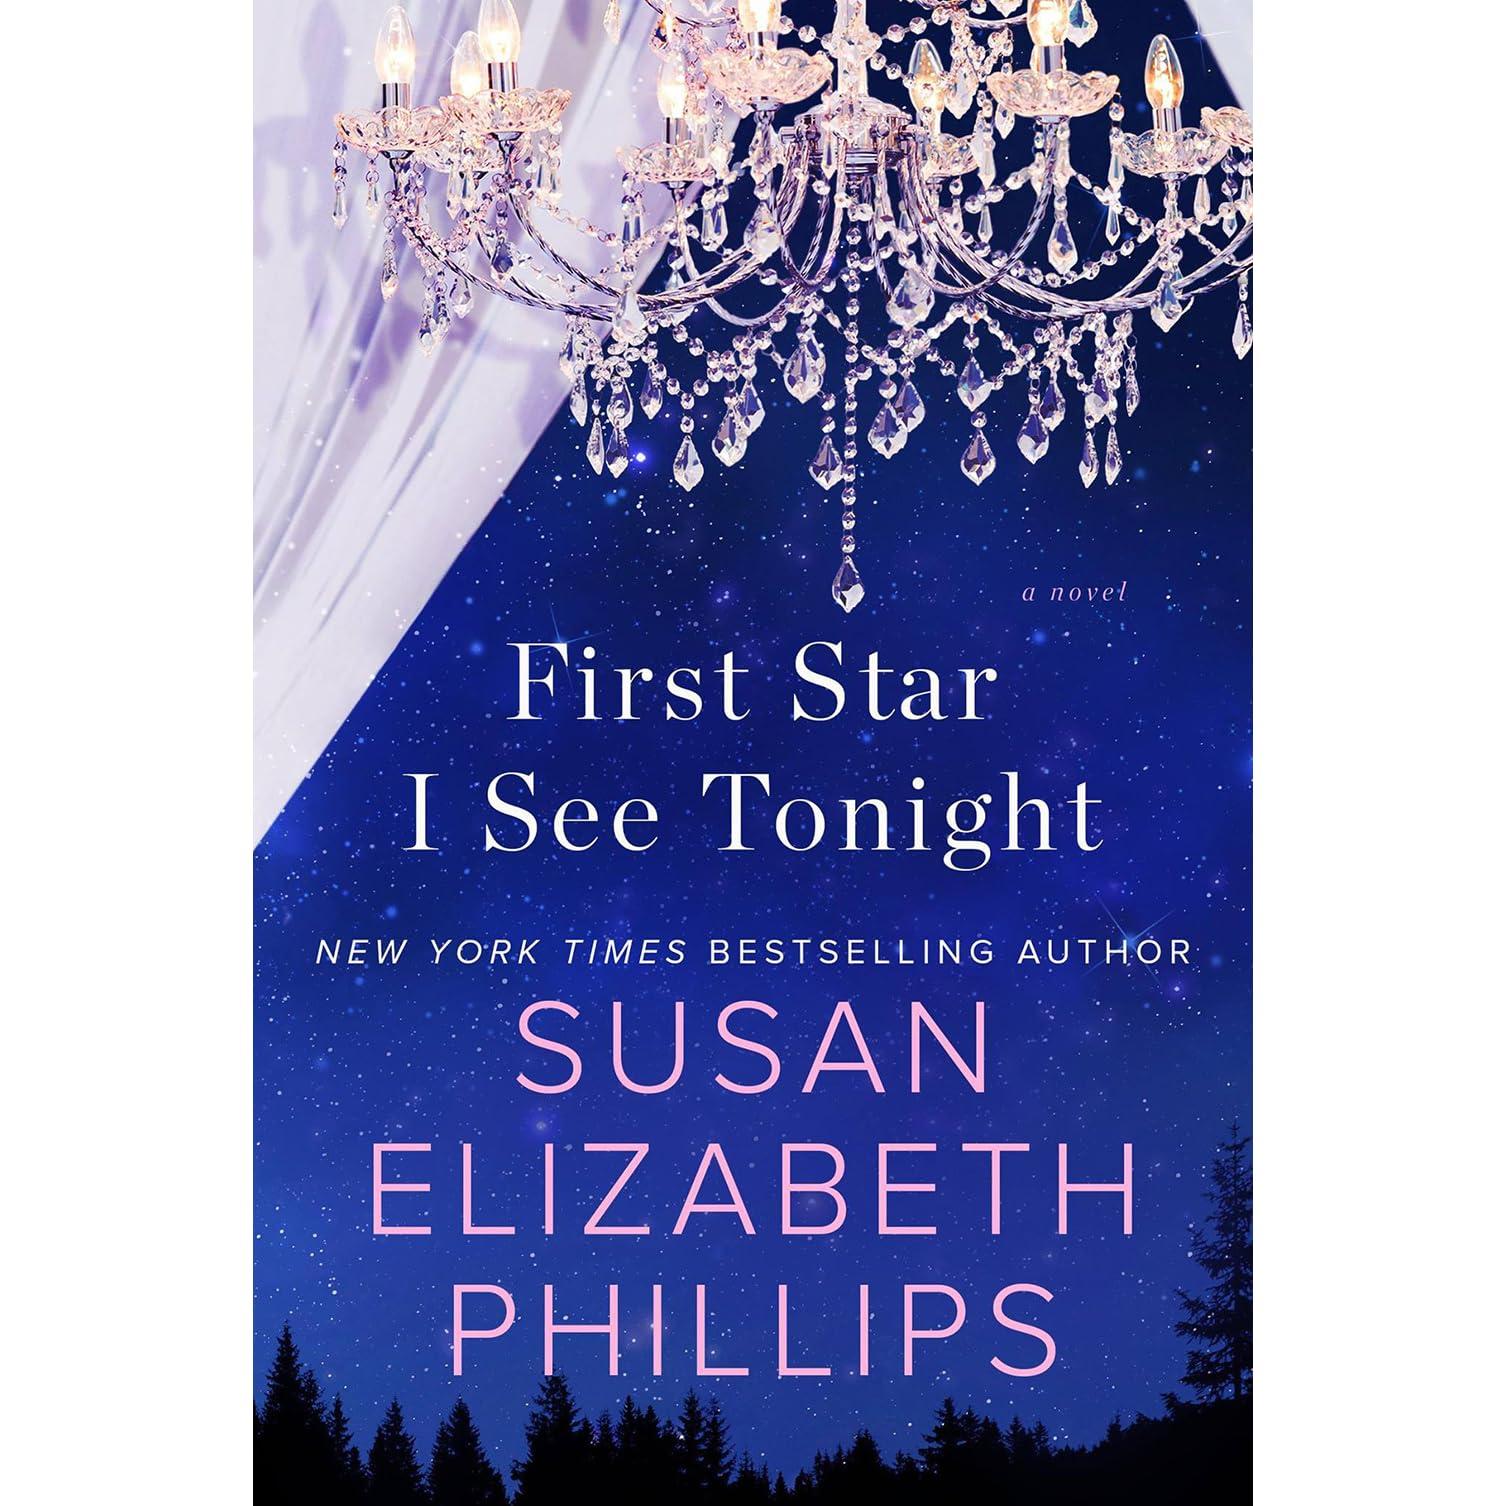 Sarah elizabeth phillips goodreads giveaways